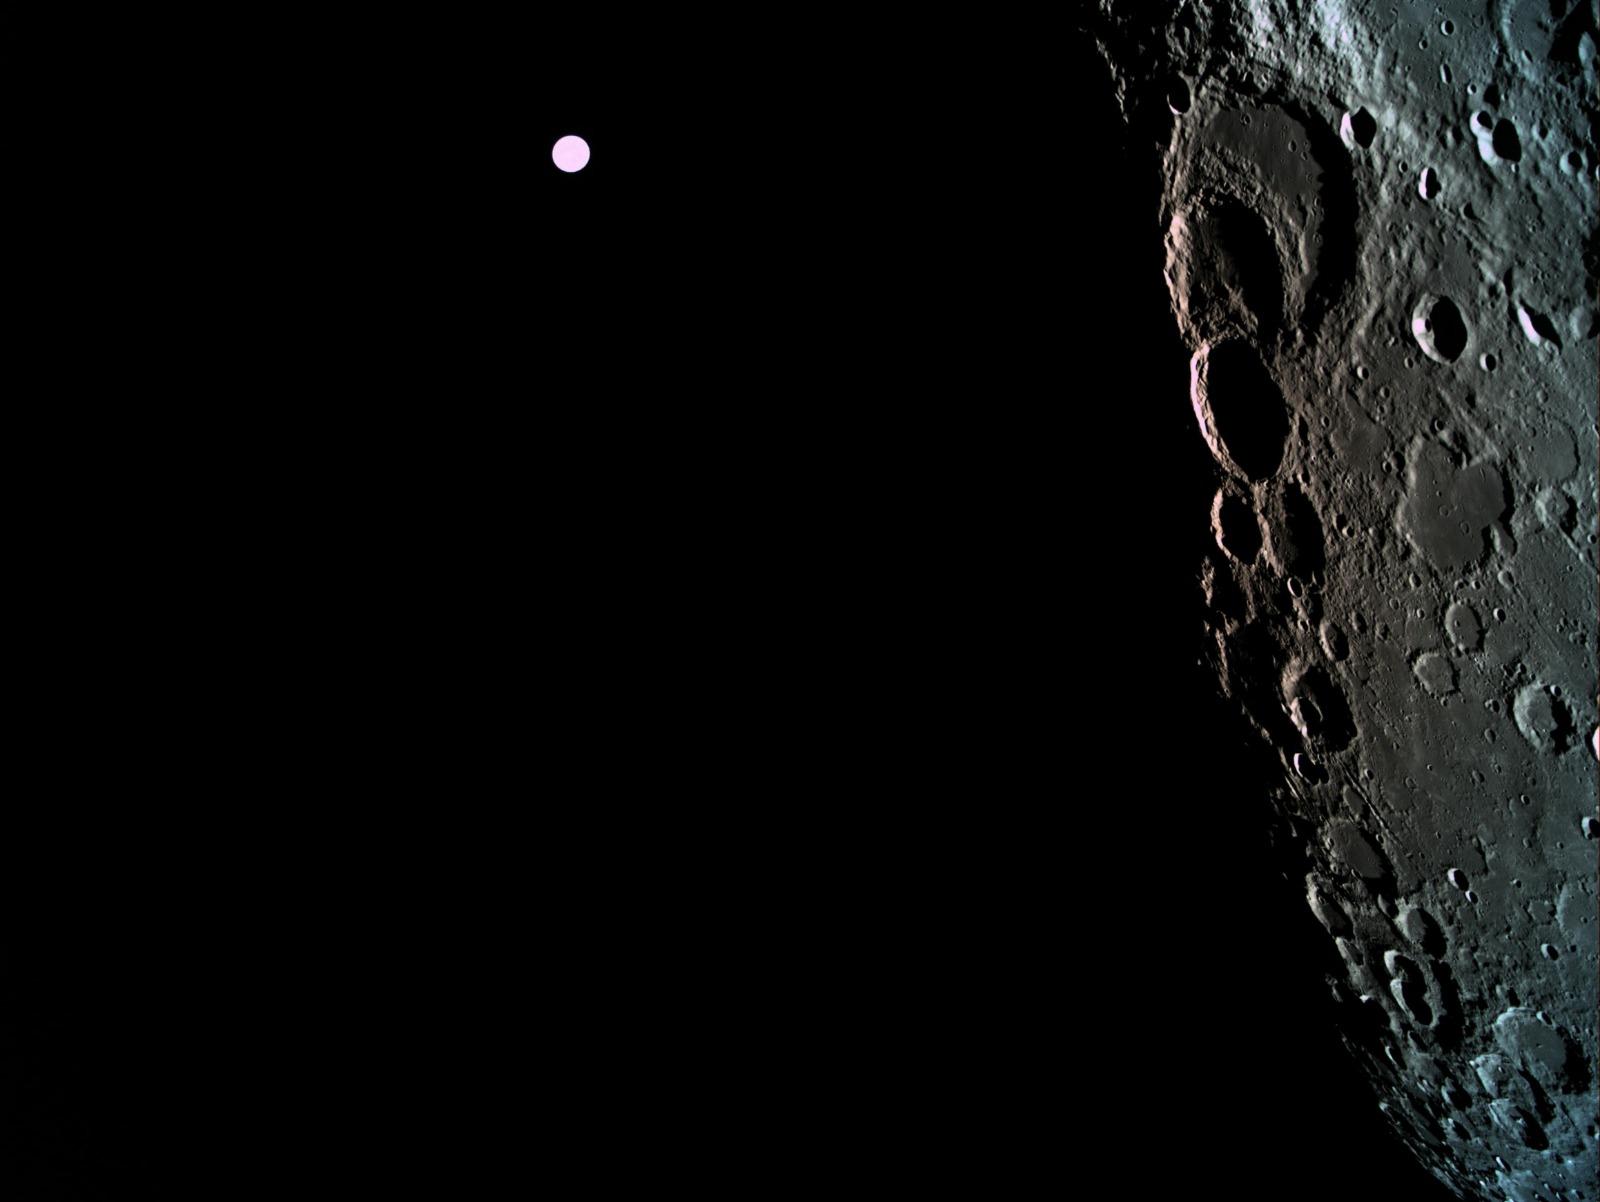 2019-moon-2.jpeg